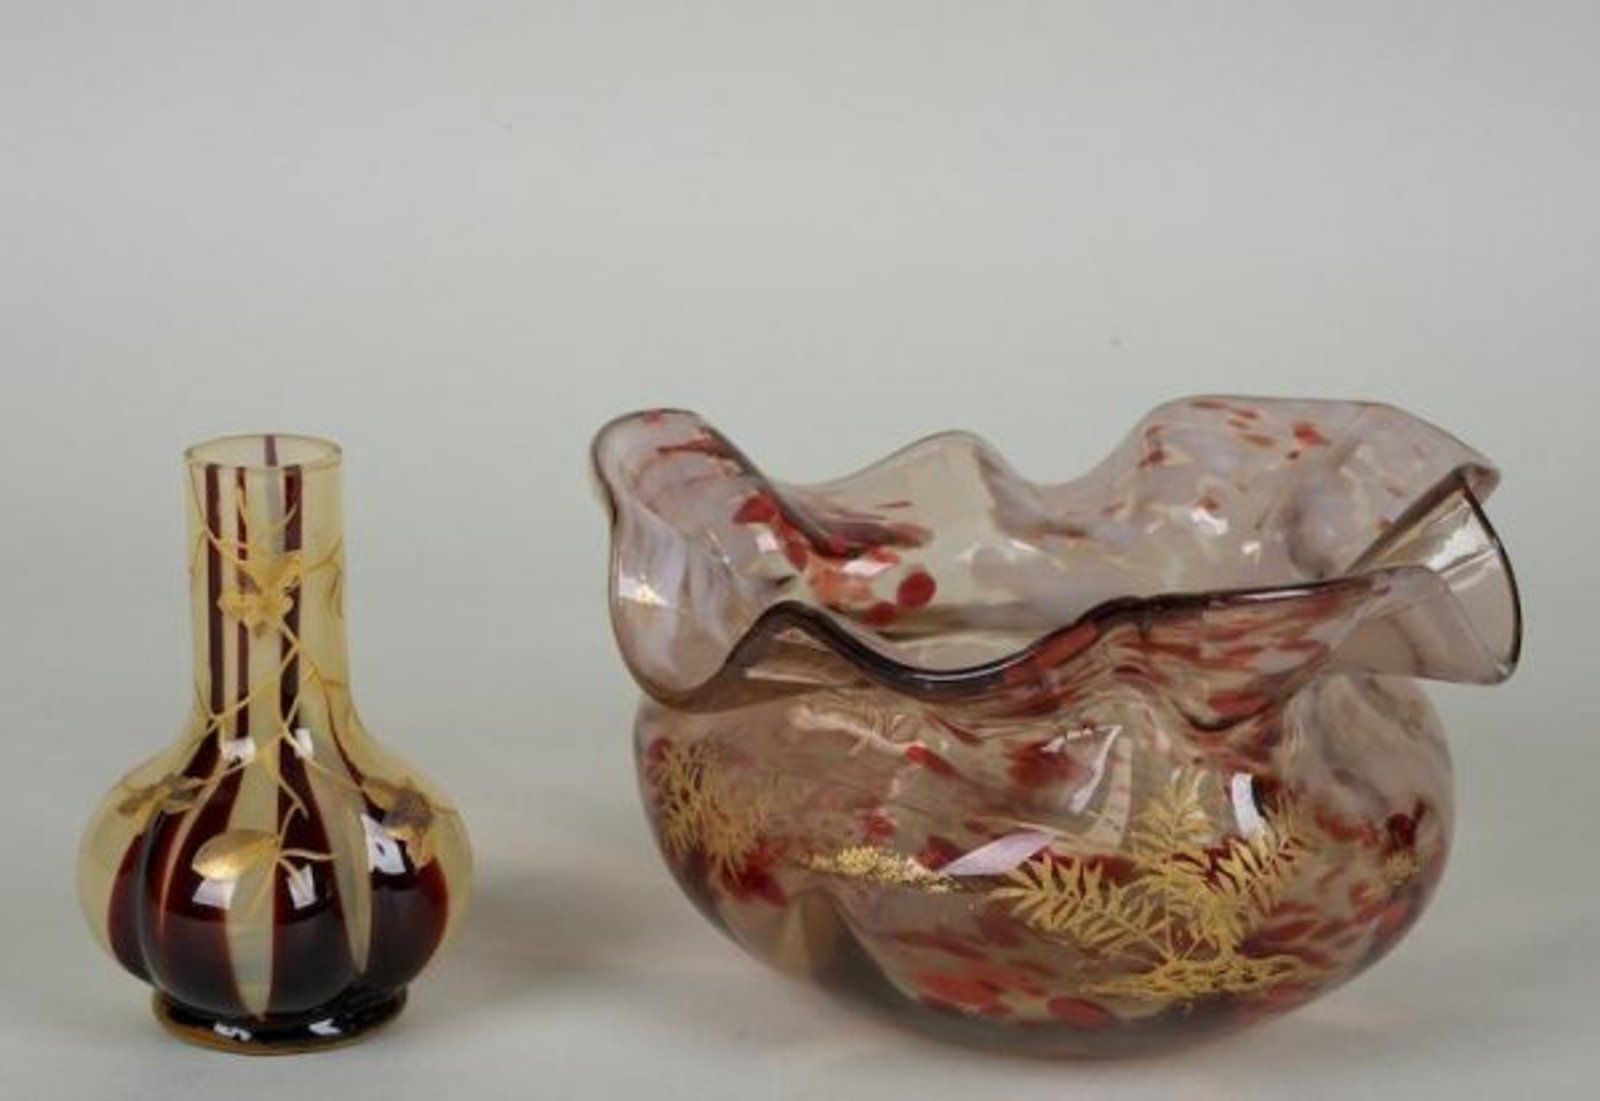 851 2 pieces victorian art glass with raised gilt de